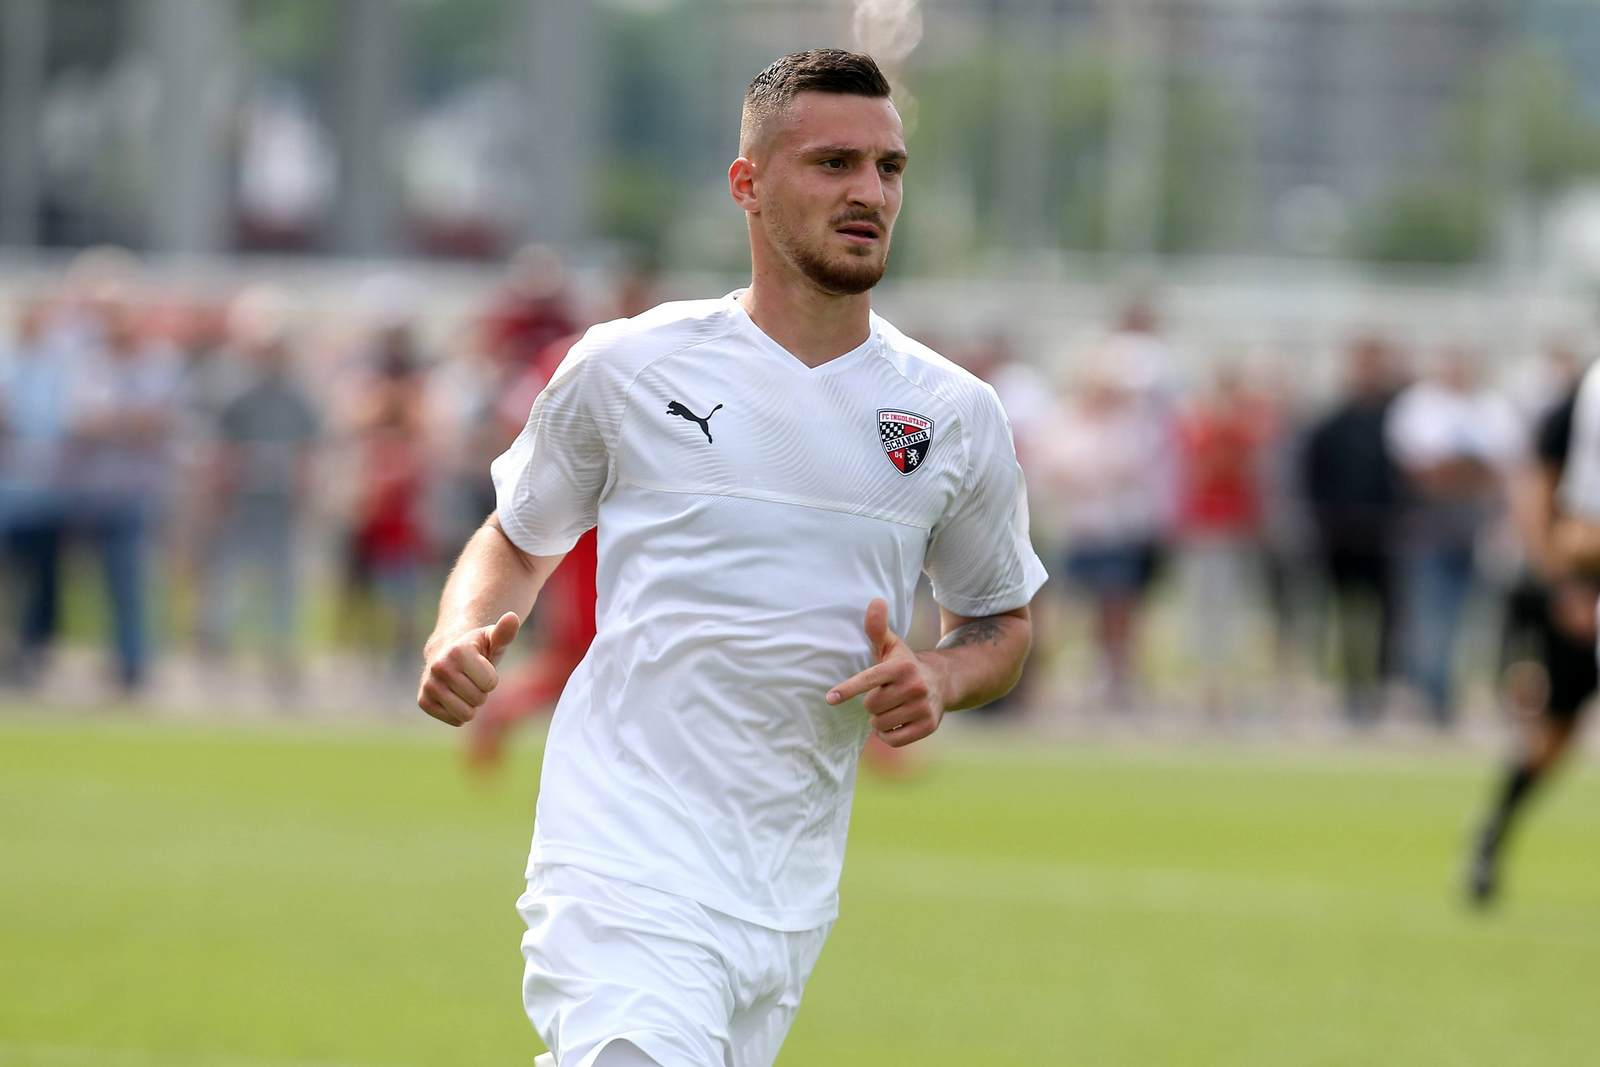 Maximilian Wolfram vom FC Ingolstadt